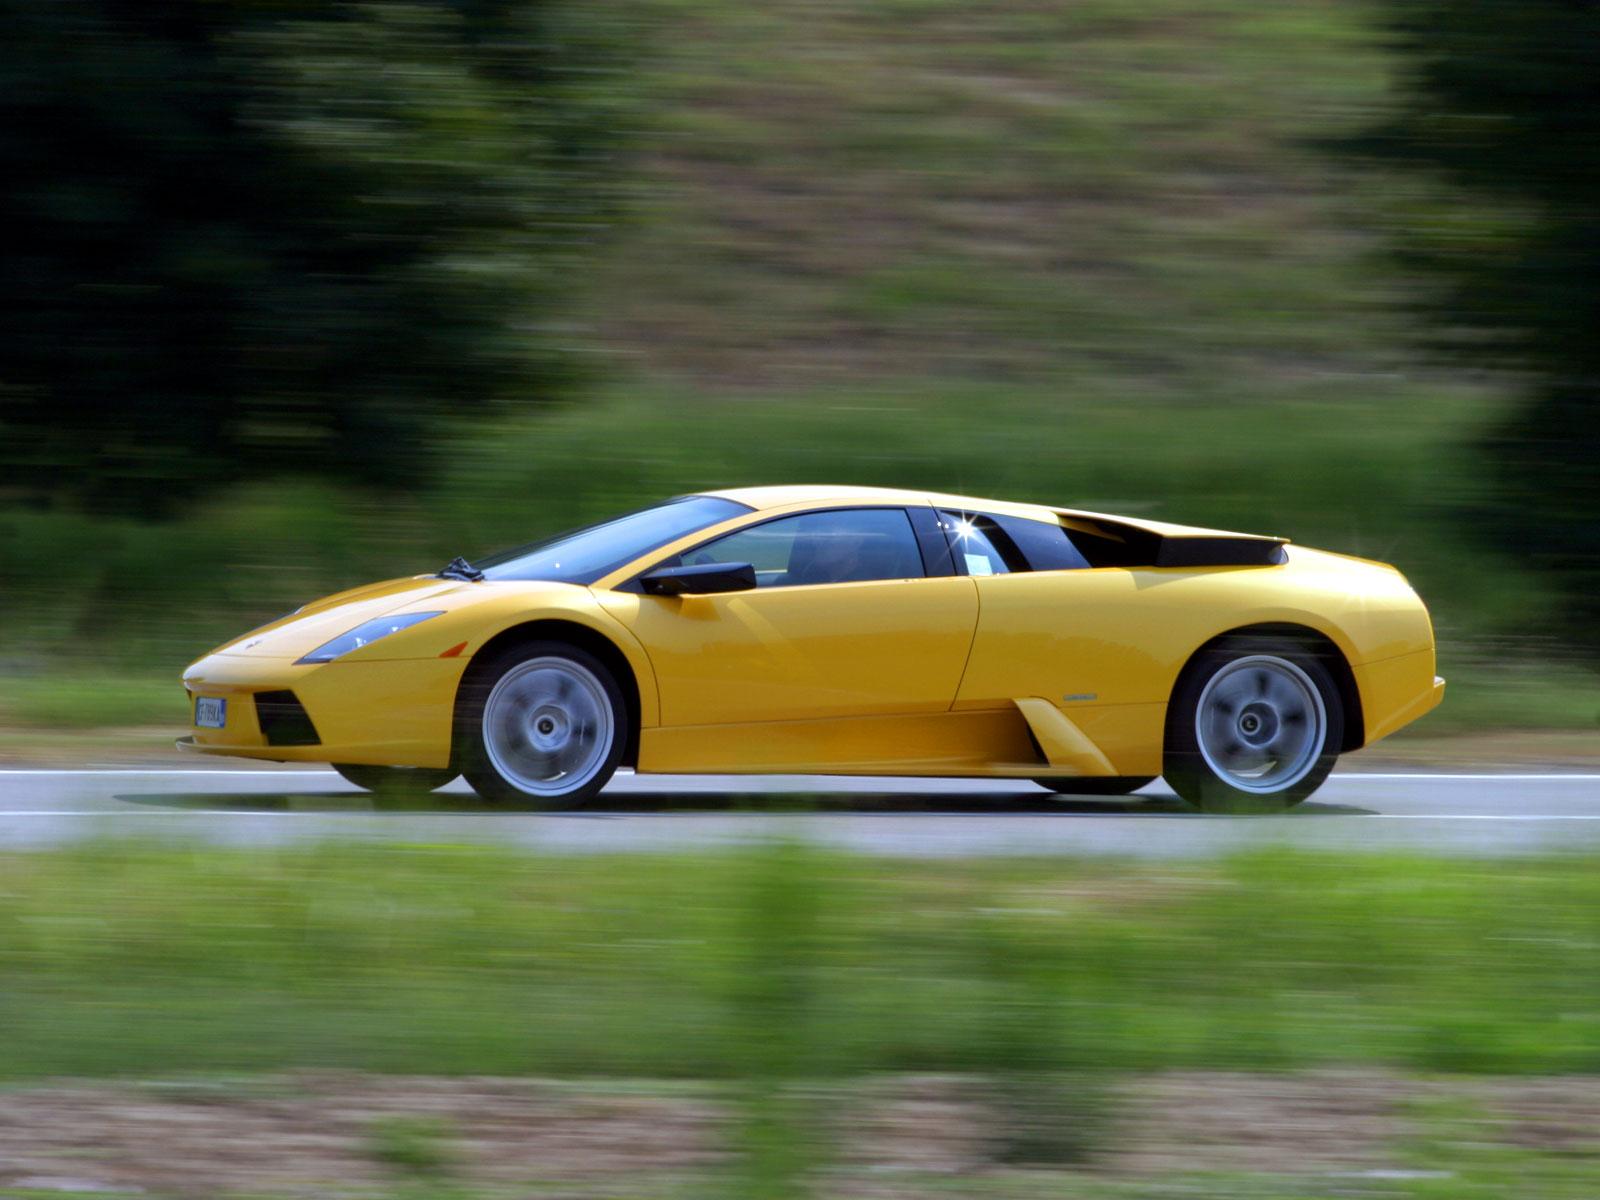 Lamborghini Murcielago photo